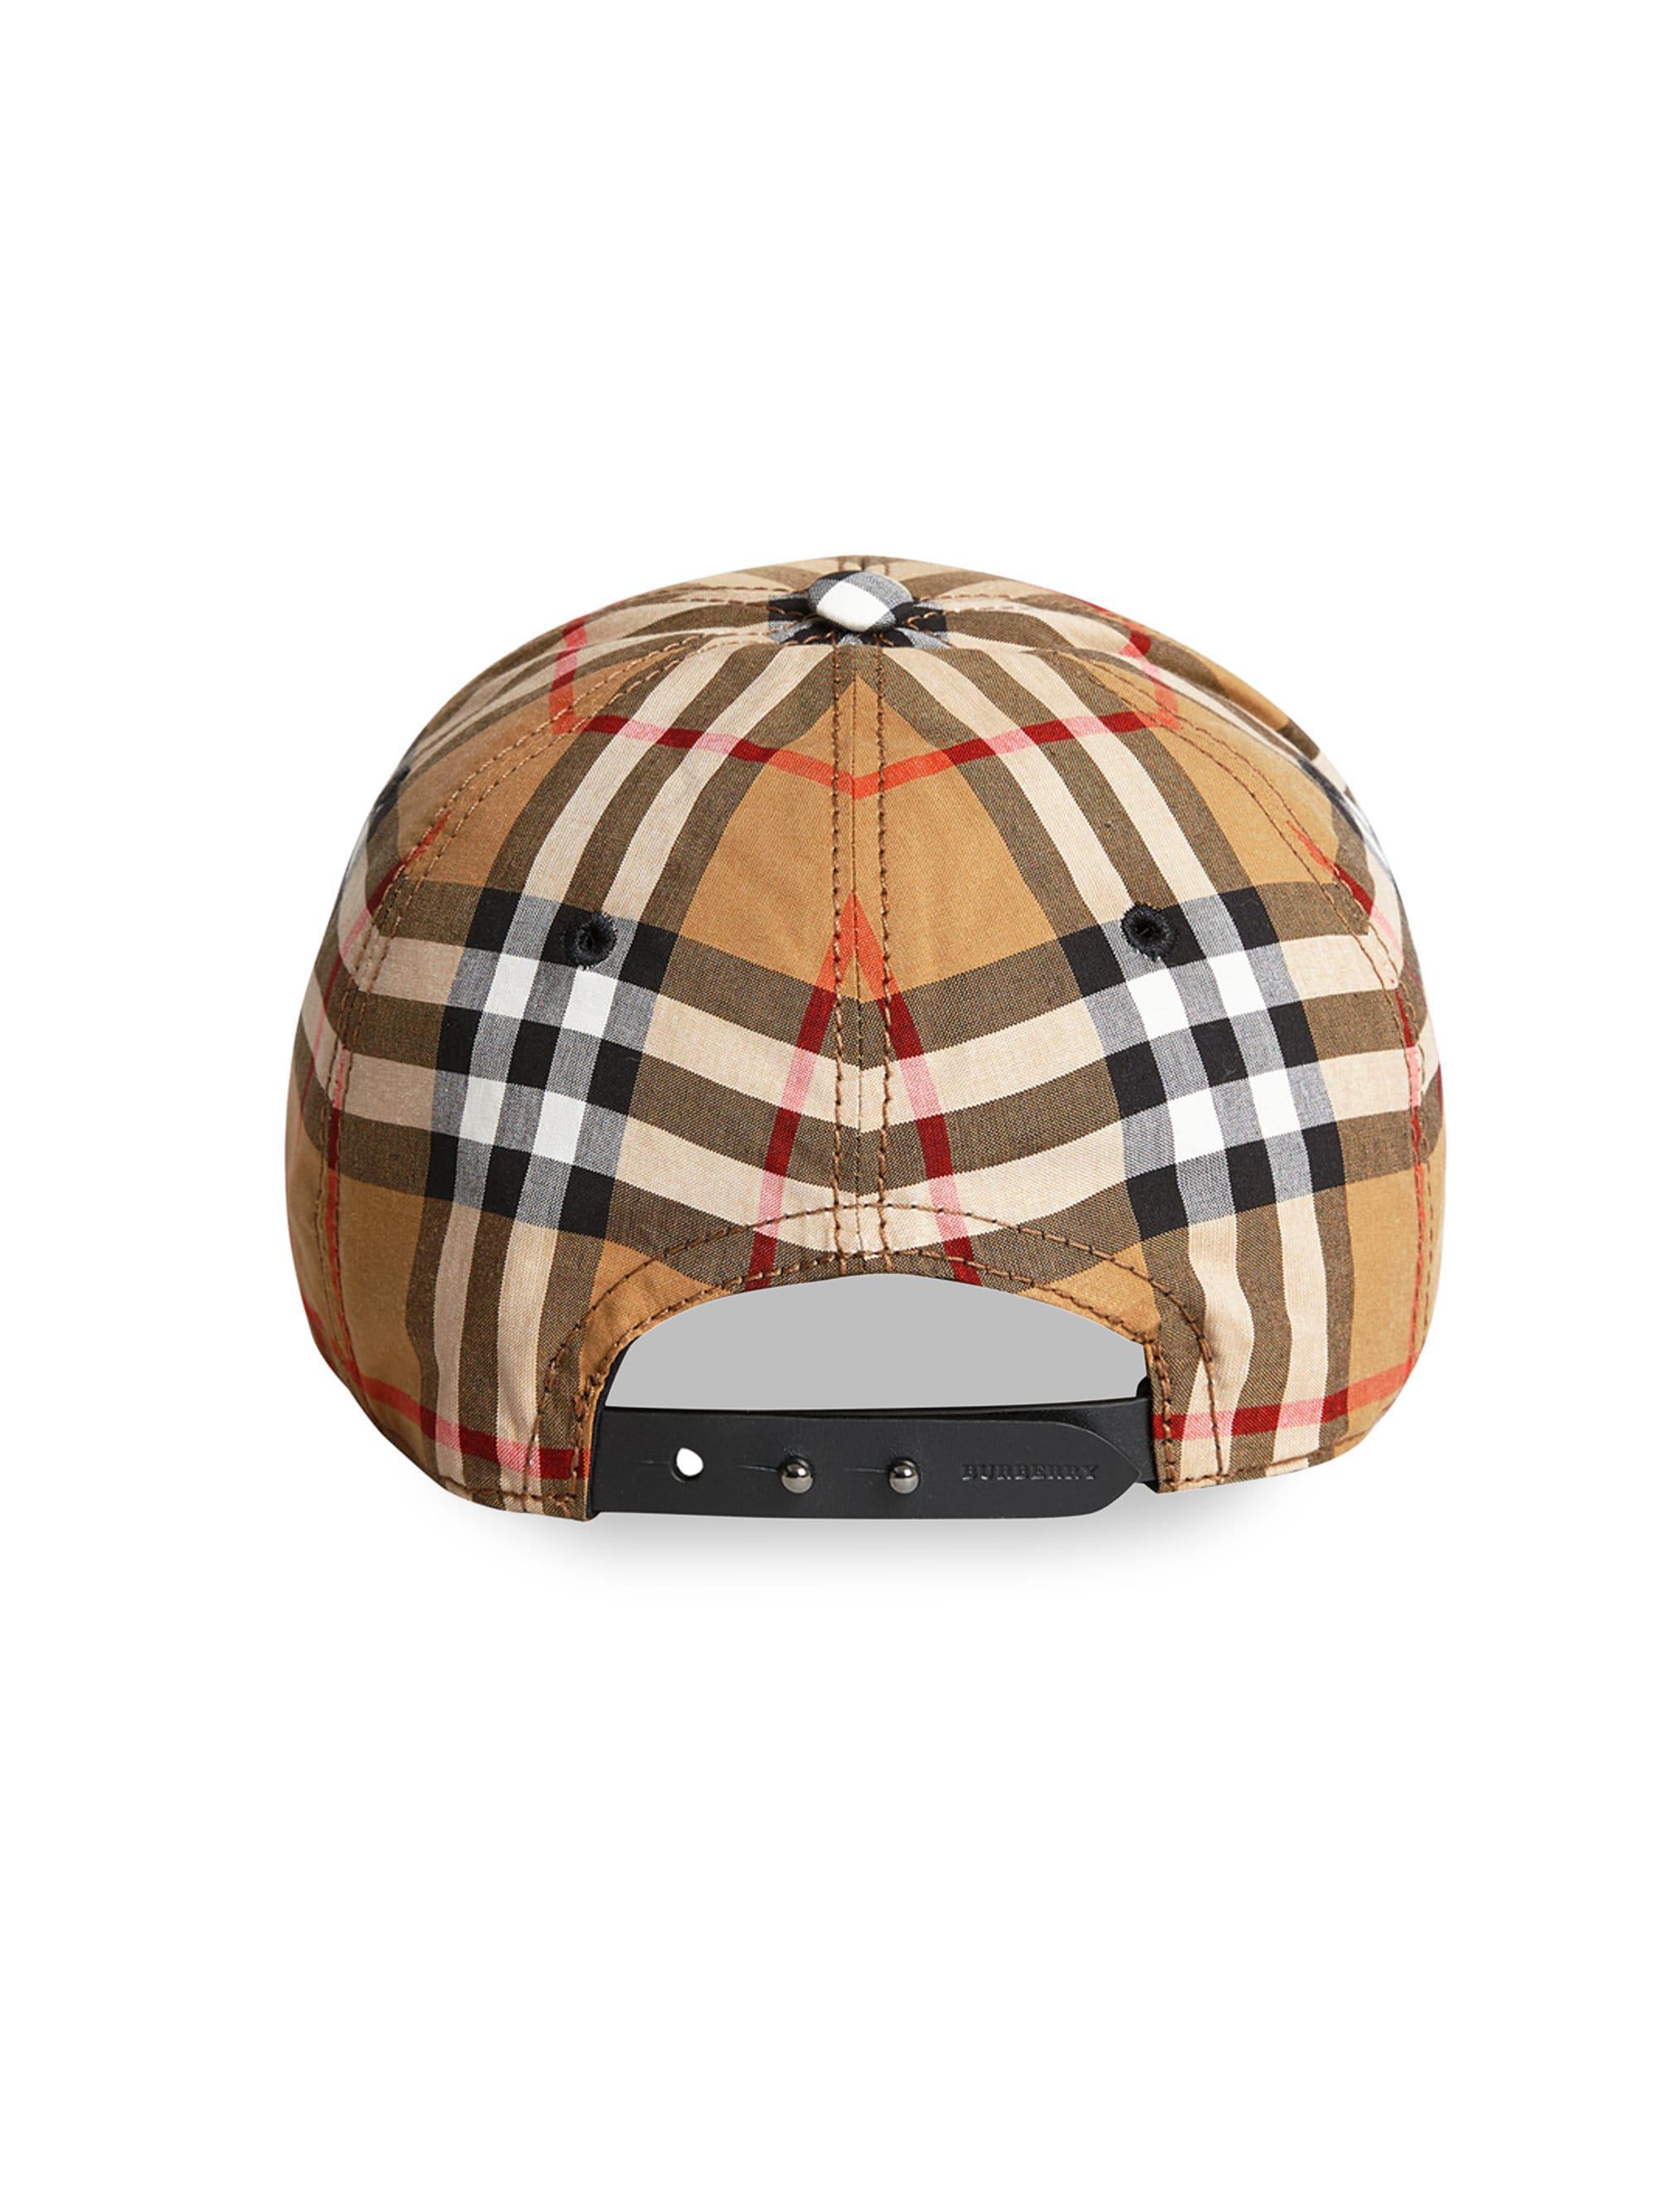 22c3f360d12 Burberry - Multicolor Vintage Check Cotton Baseball Cap for Men - Lyst.  View fullscreen